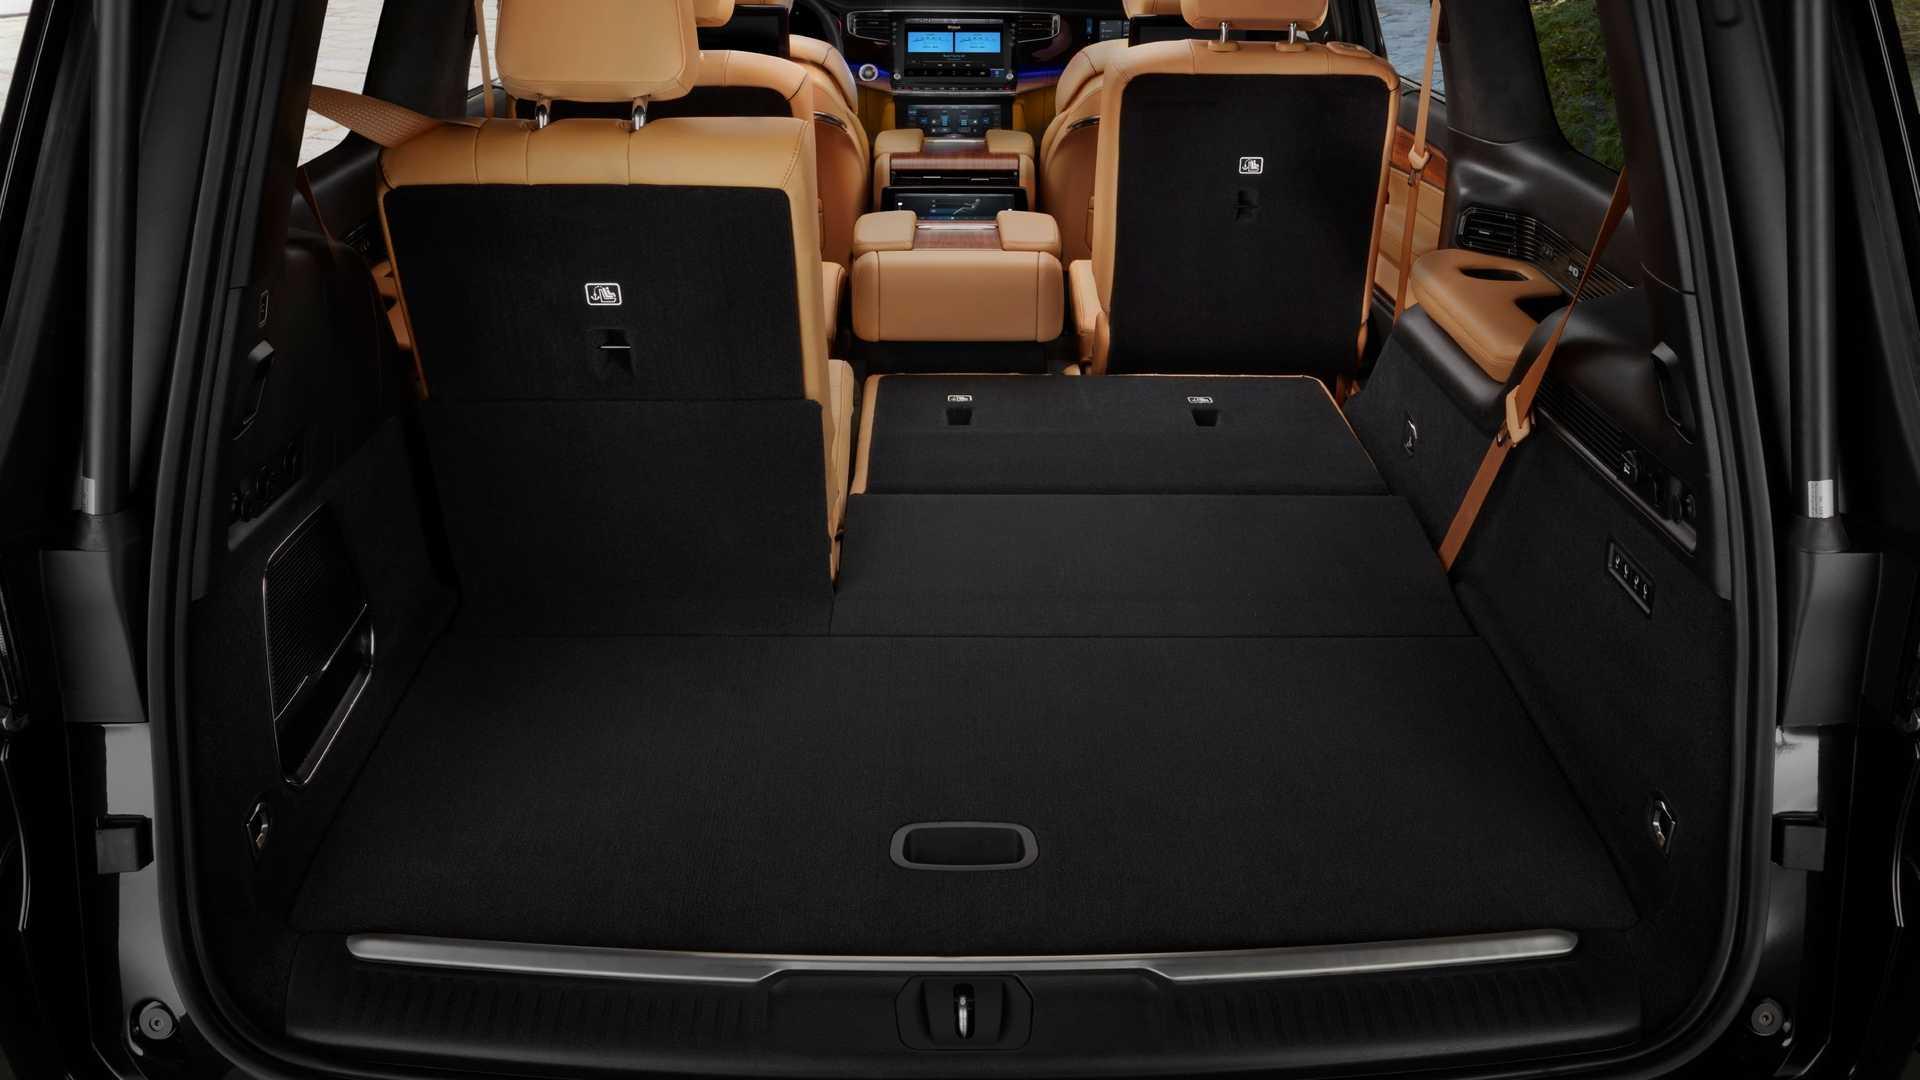 2022-jeep-grand-wagoneer-interior-cargo-space-2